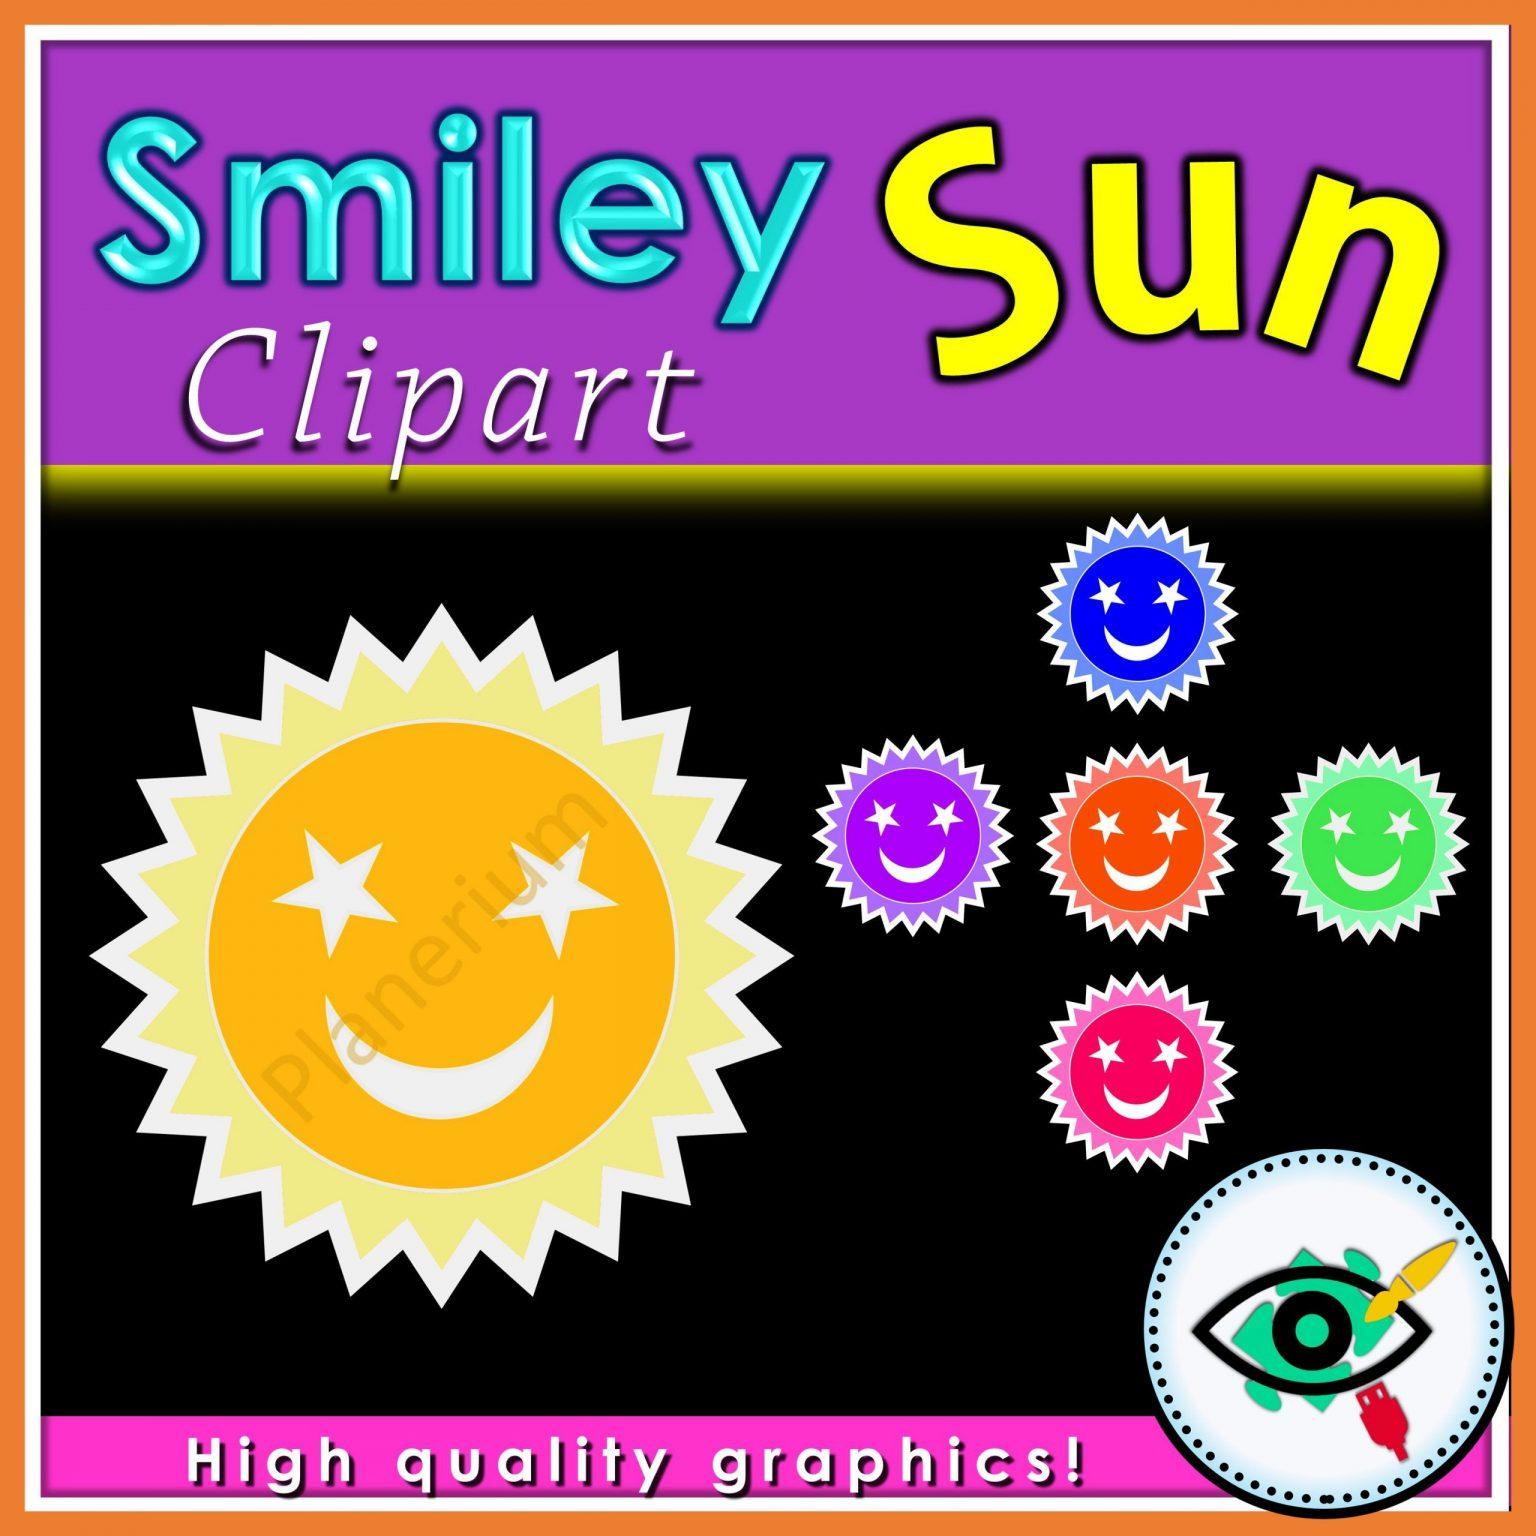 Summer - Clipart - Smiley Sun - Title 2